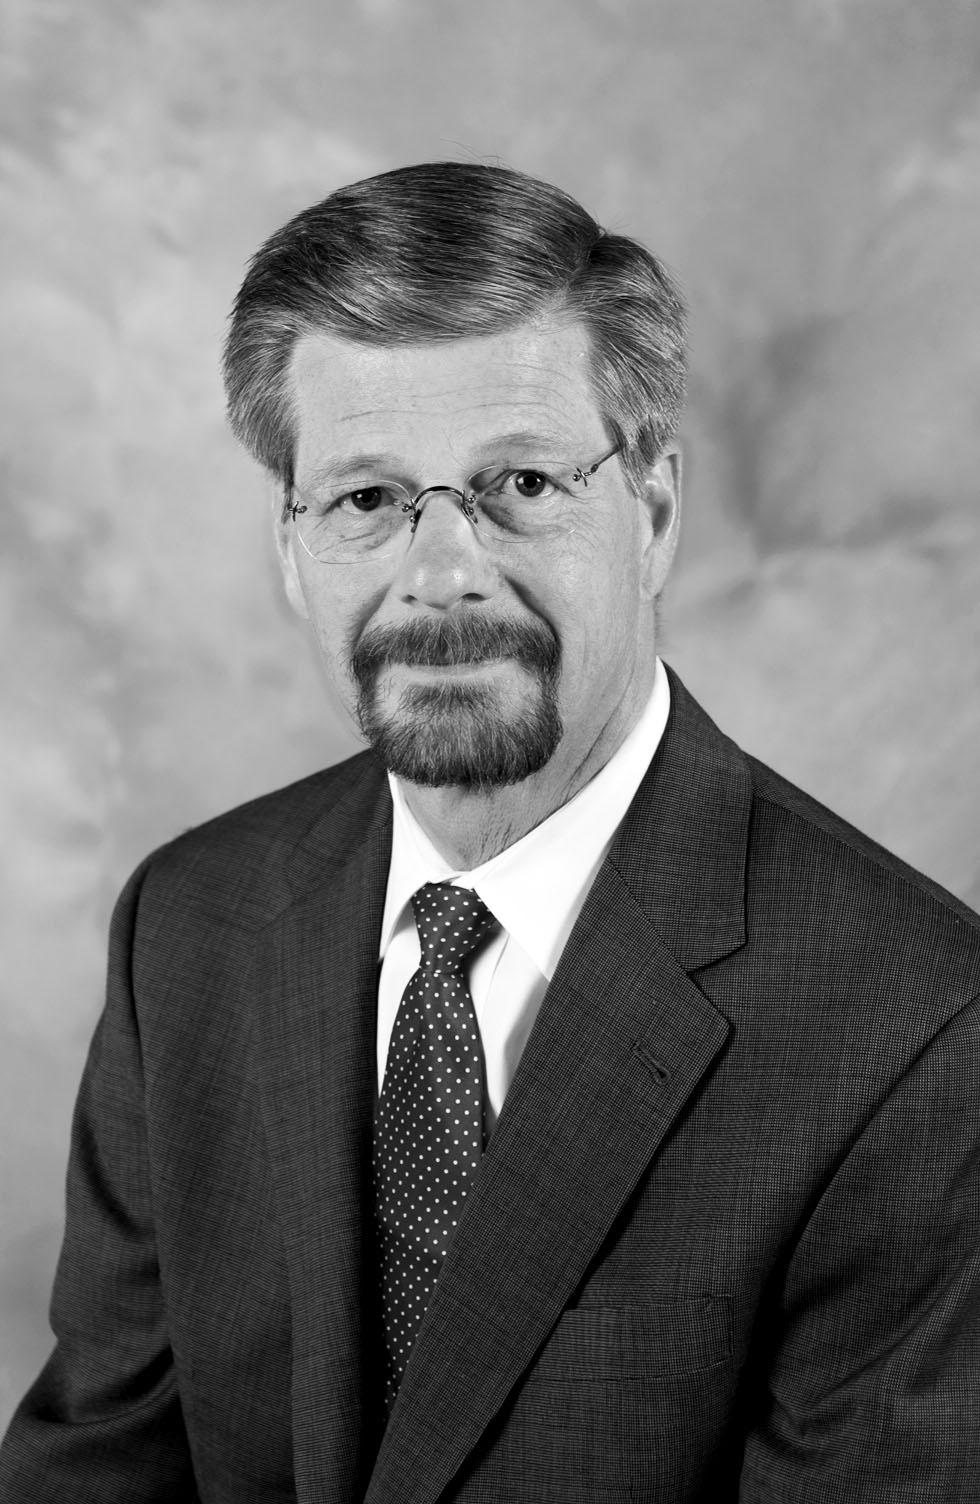 Jack R. Lohmann